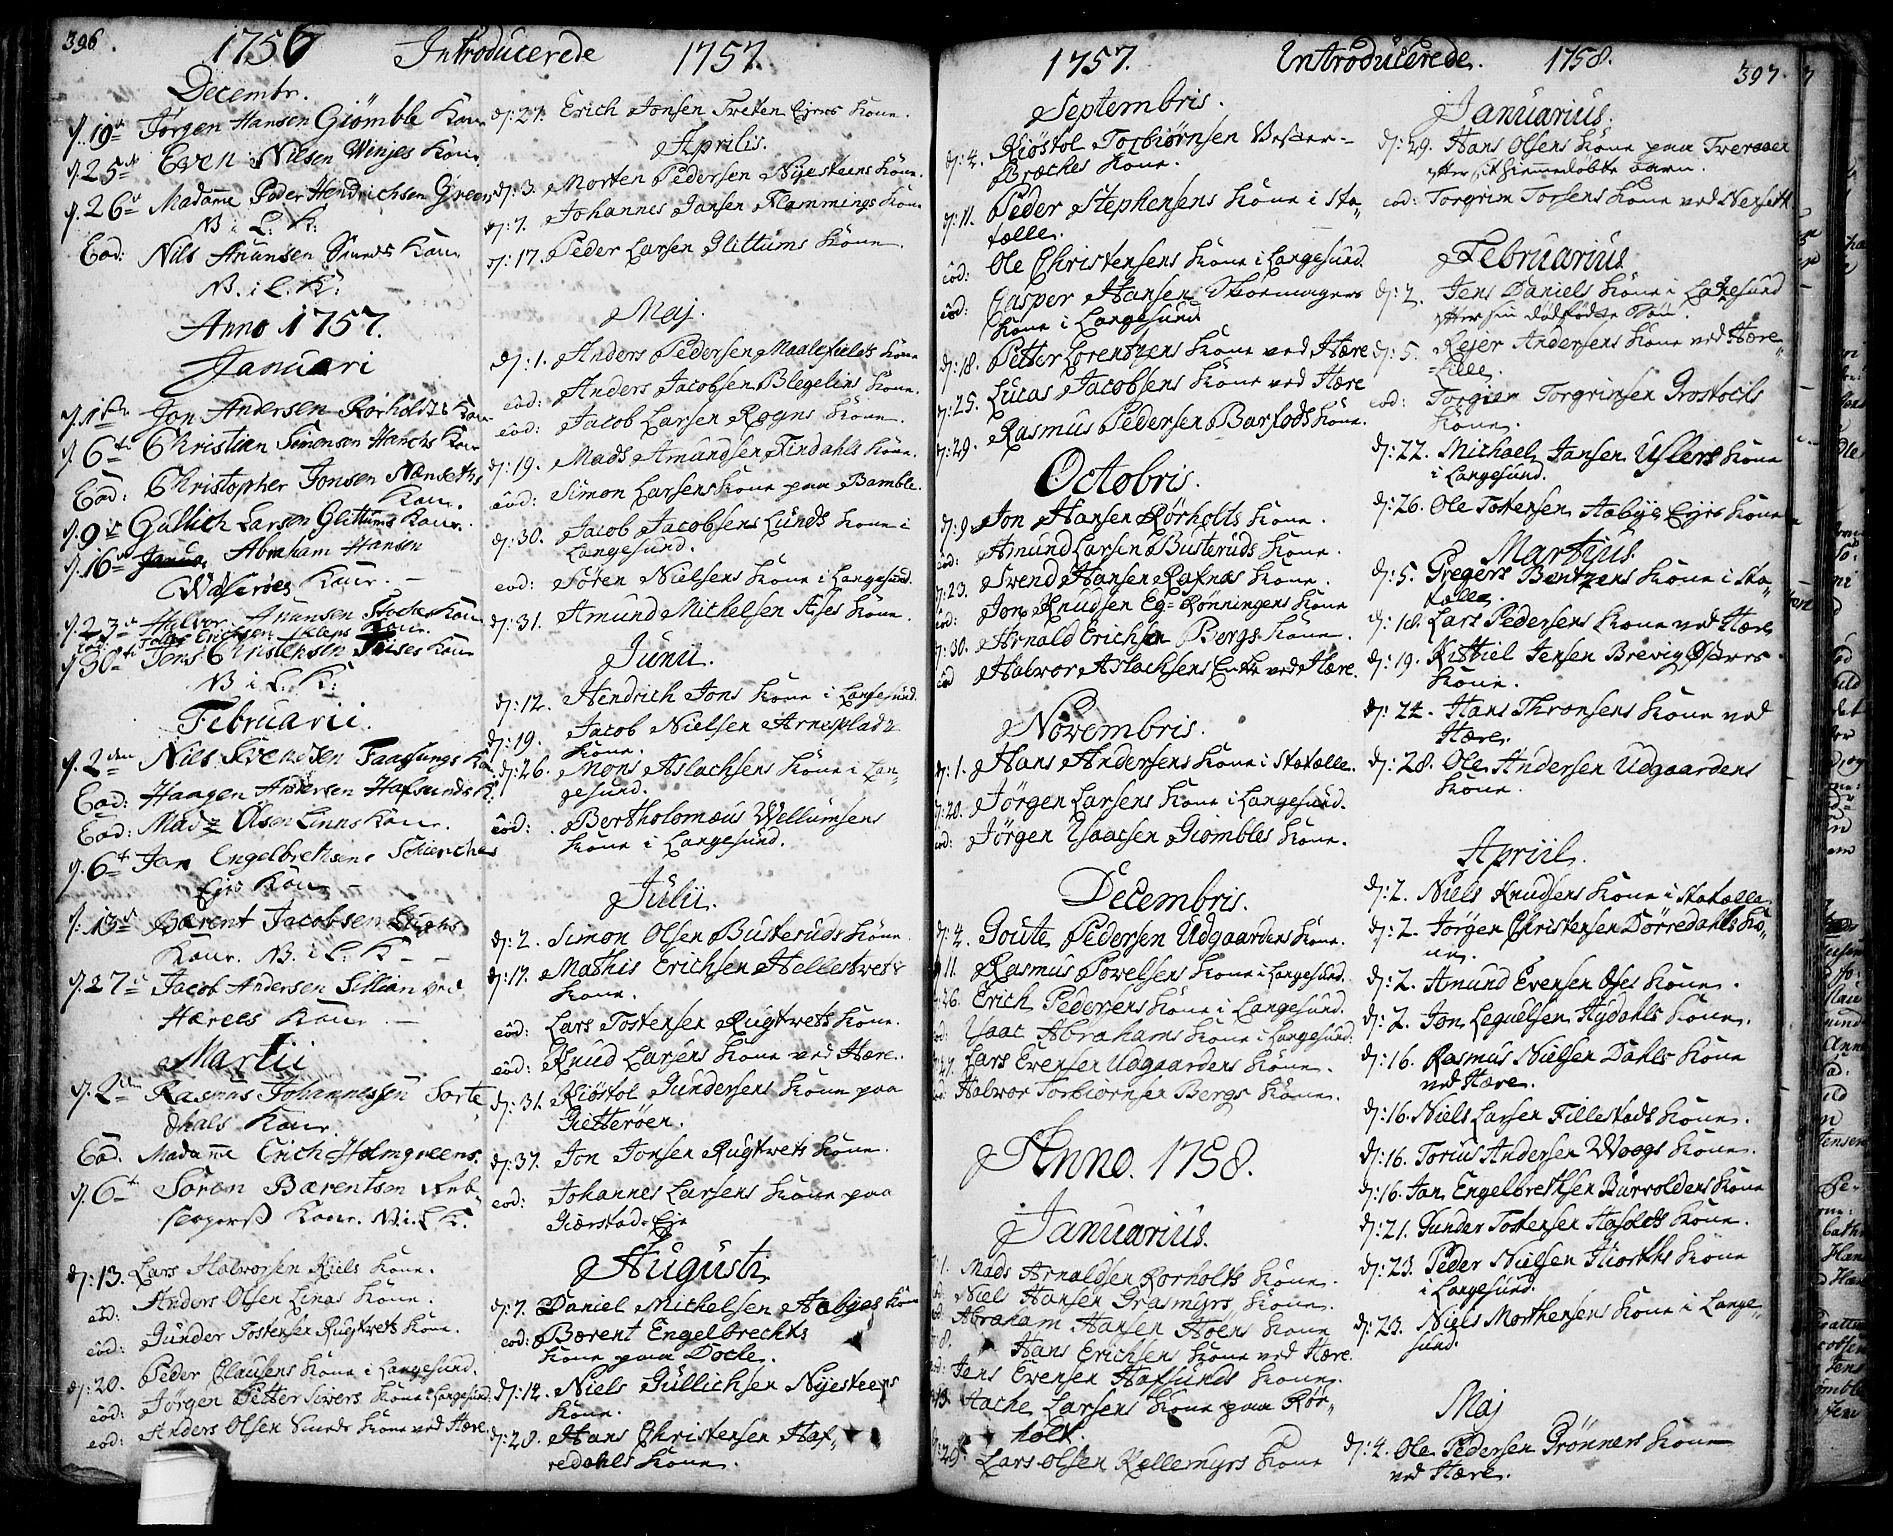 SAKO, Bamble kirkebøker, F/Fa/L0001: Ministerialbok nr. I 1, 1702-1774, s. 396-397